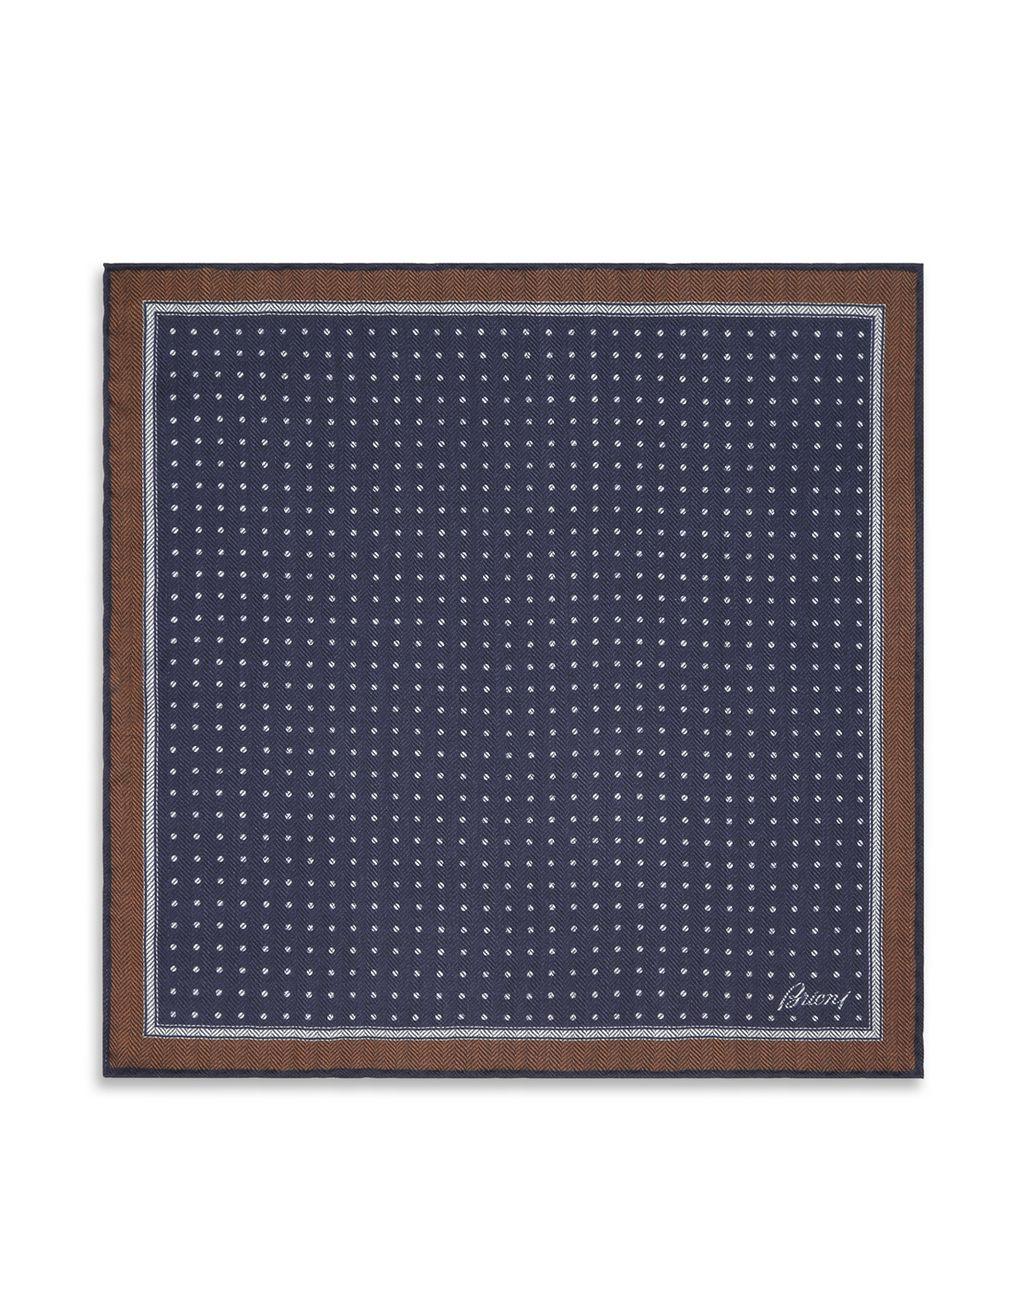 BRIONI ポケットチーフ ブルー ヘリンボーン ネクタイ&ポケットチーフ メンズ f